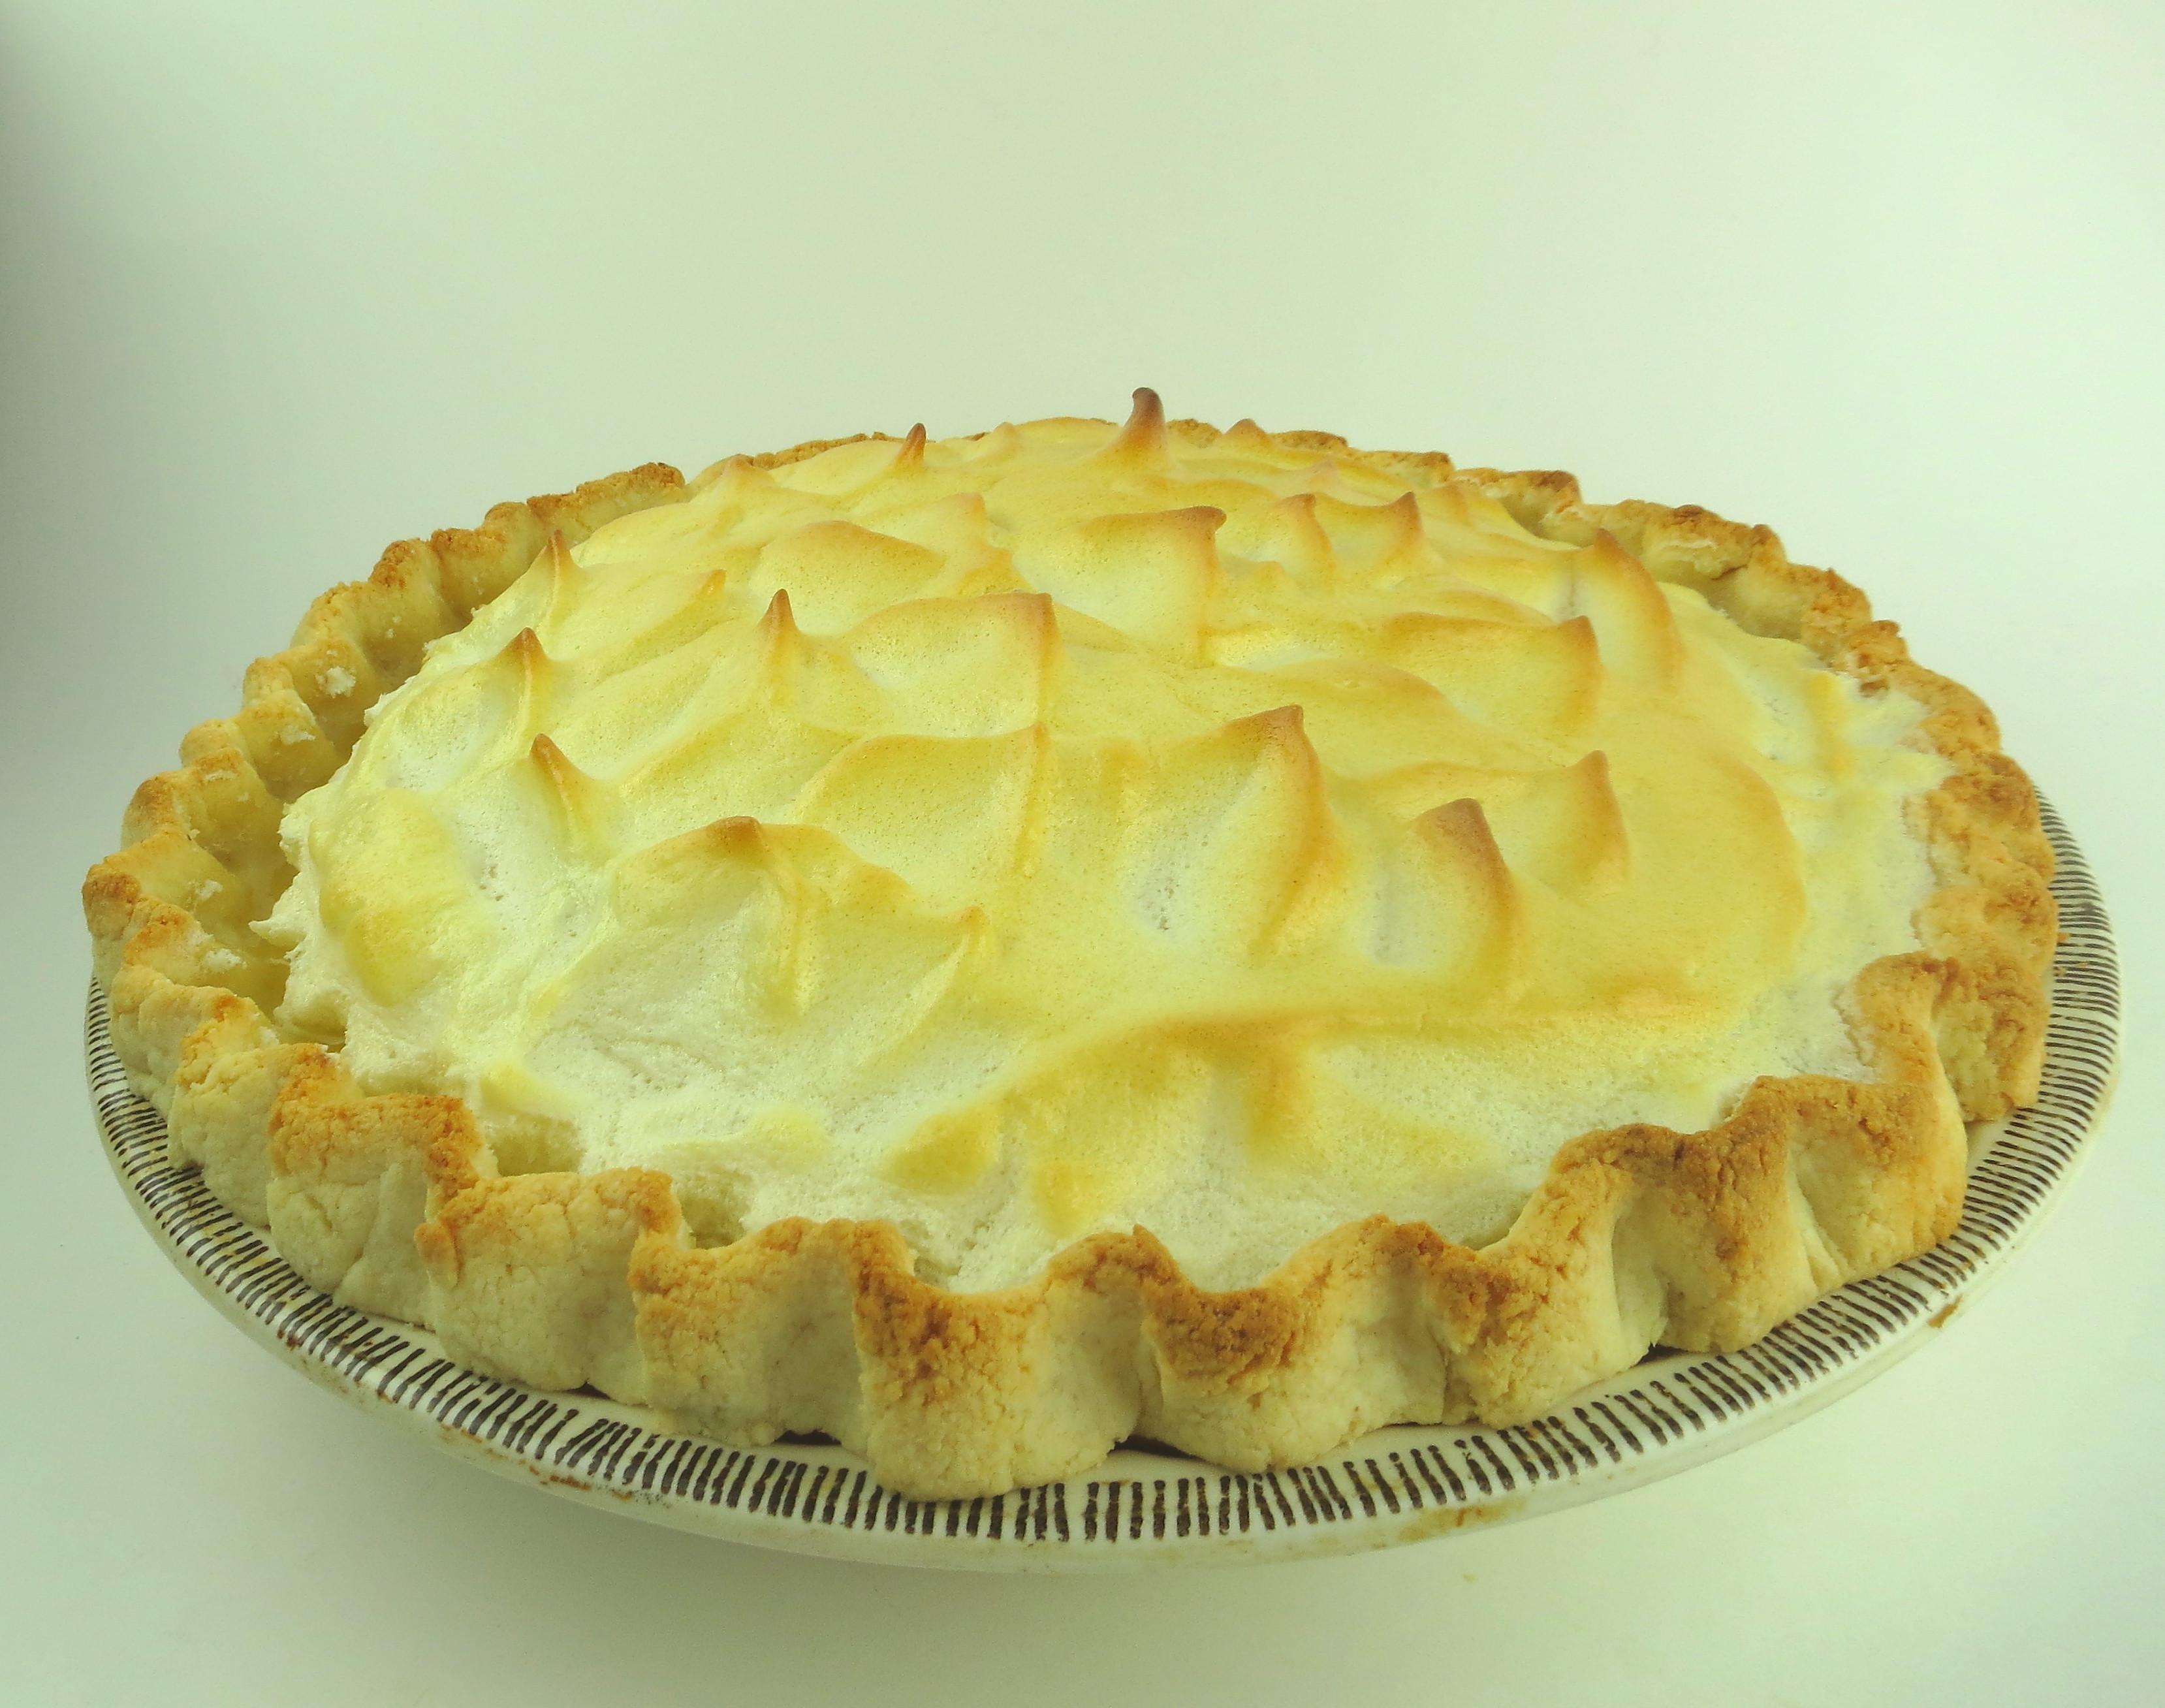 Healthy Lemon Meringue Pie  Paleo Lemon Meringue Pie – Jane s Healthy Kitchen